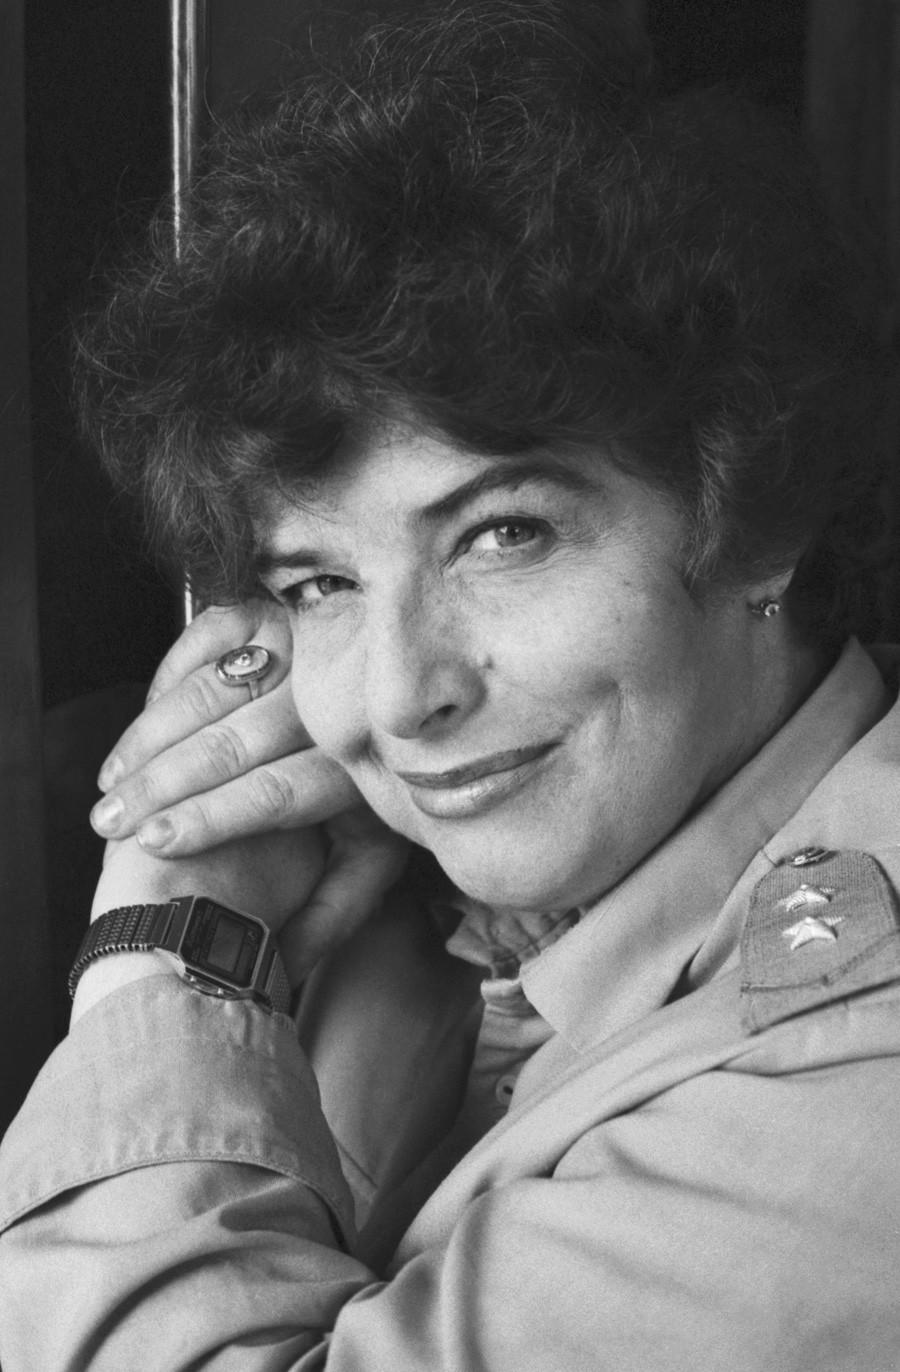 8 de junho 1989, condutora Tamara Grigórievna Arantchii